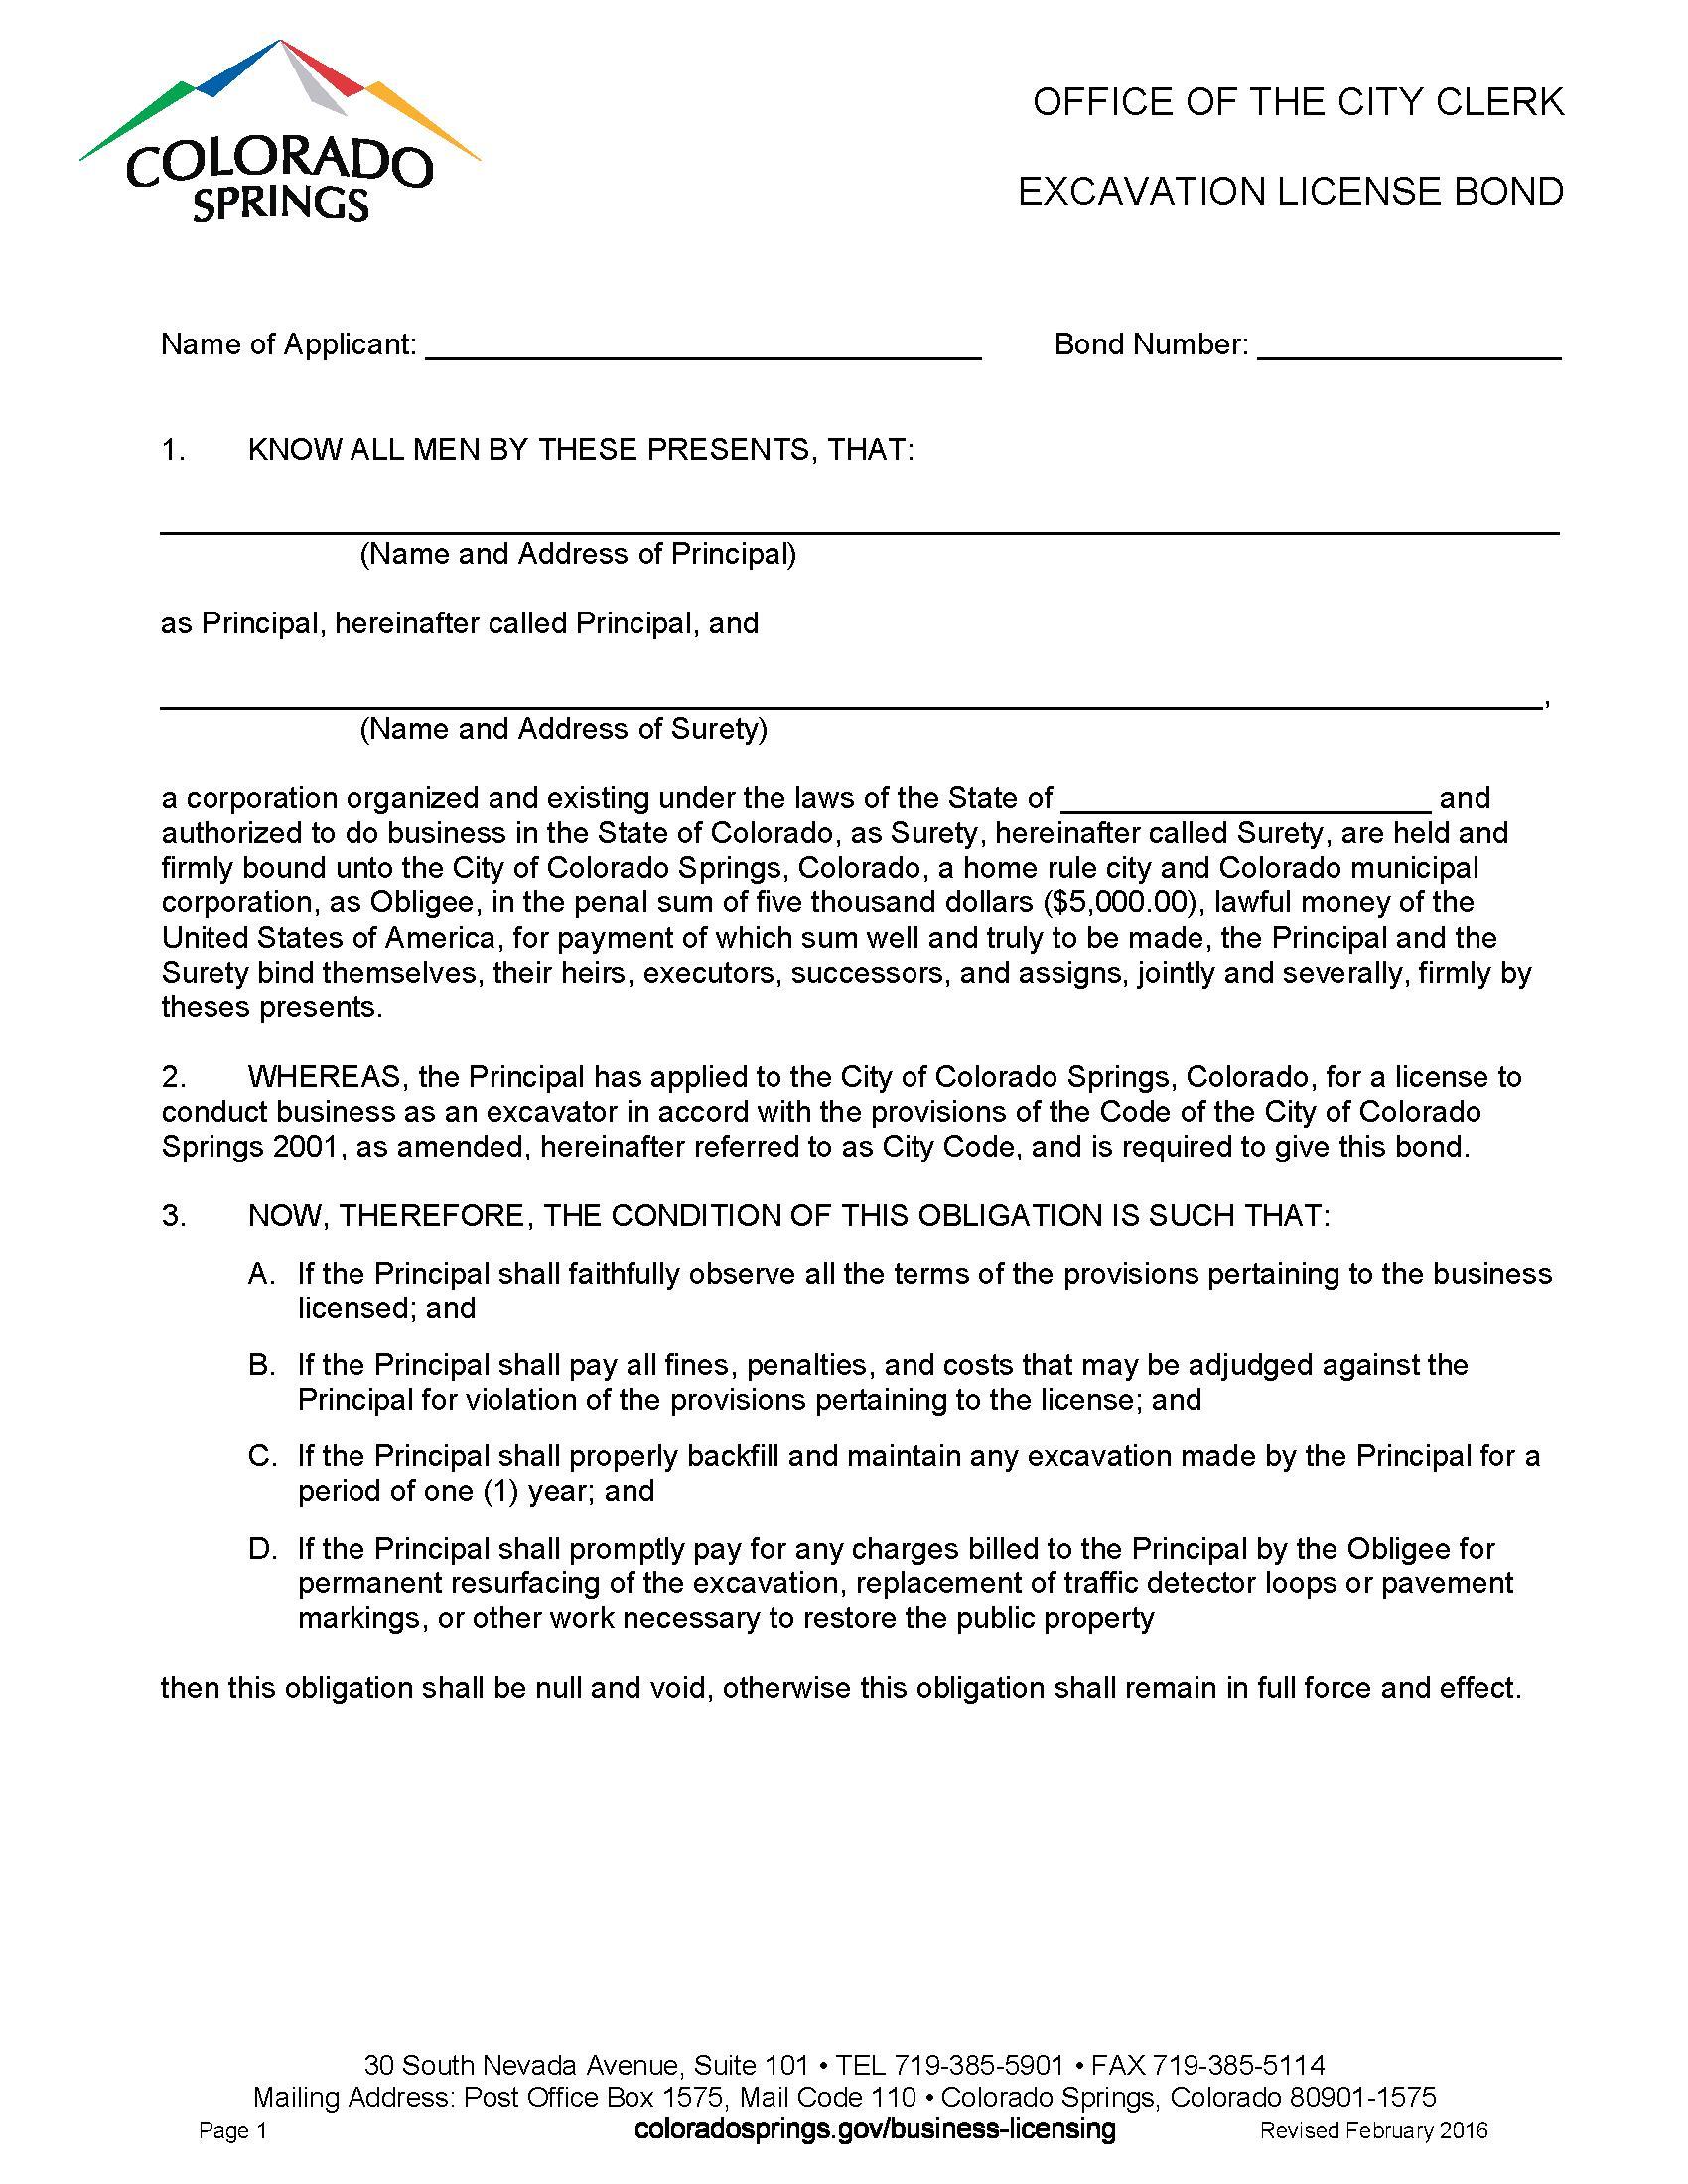 City of Colorado Springs Excavation License sample image